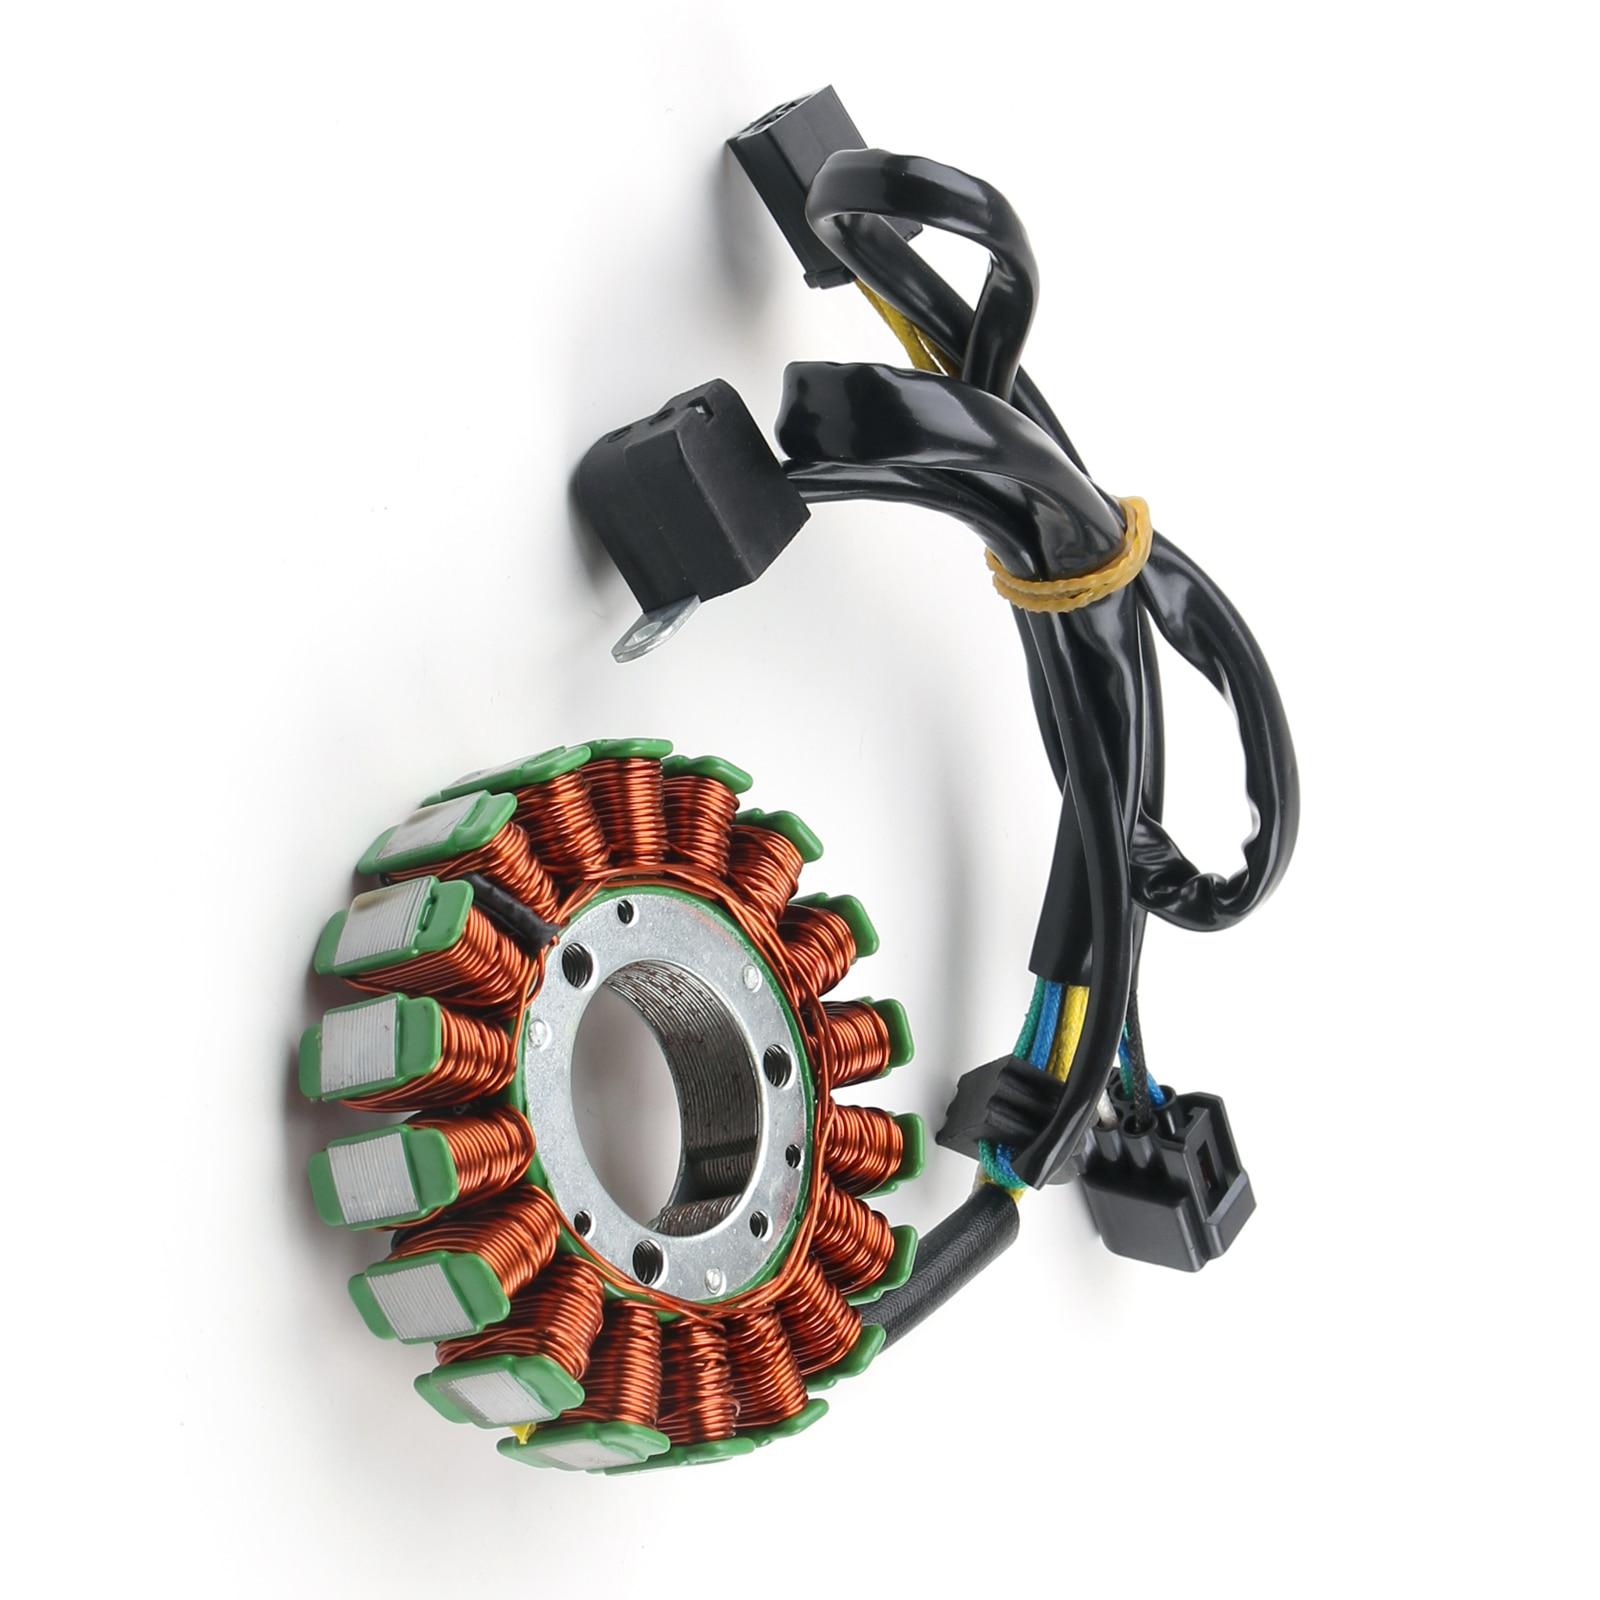 Artudatech Magneto Stator Coil For Kawasaki KLX400 2003-2004 21003-S007 For Suzuki DRZ DR-Z 400 250 Motor Accessories Parts